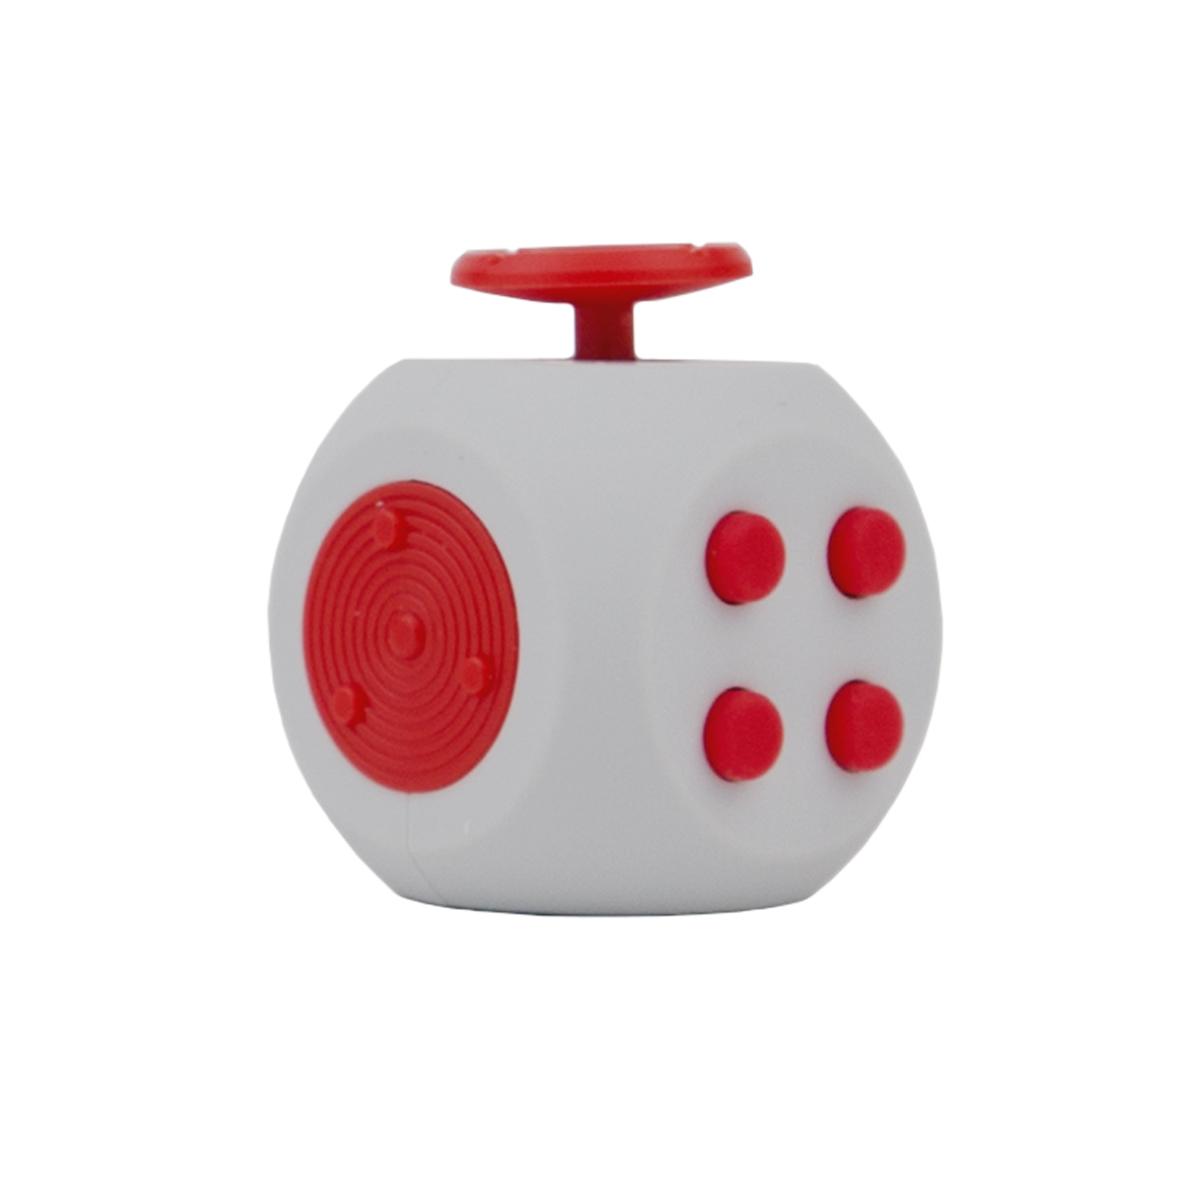 Игрушка антистресс Fidget Cube FC4001 игрушка антистресс fidget cube белый 6125